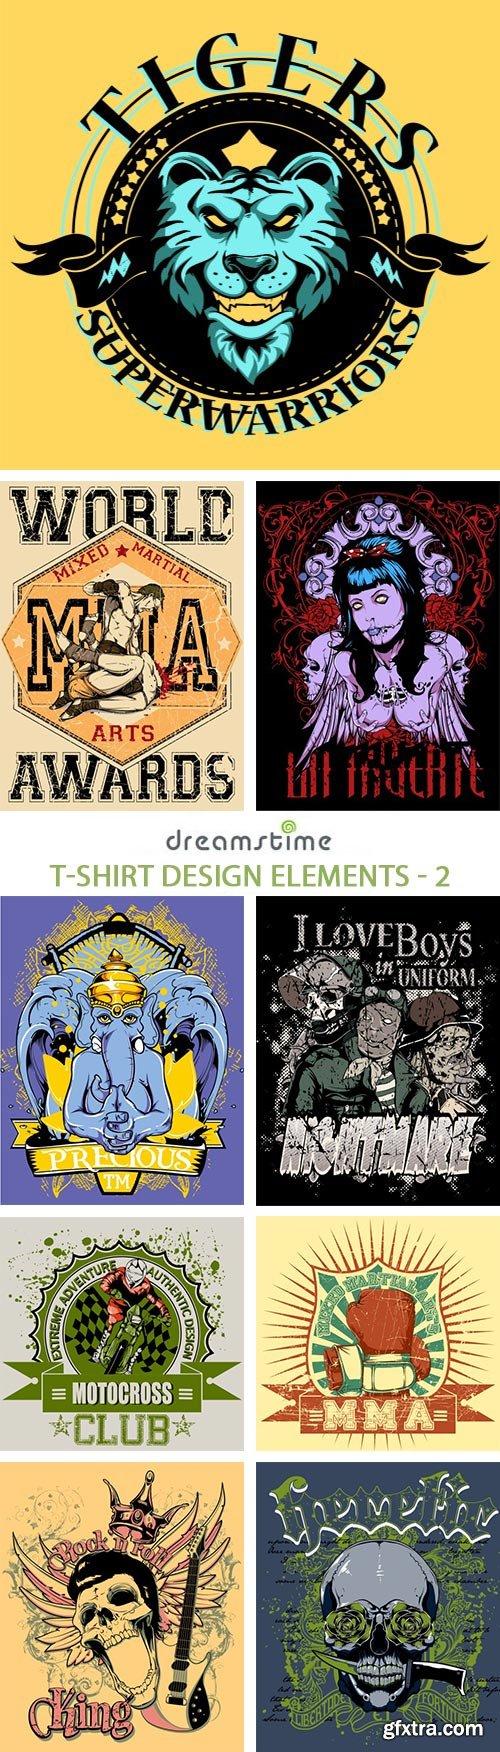 Shirt design elements - T Shirt Design Elements 2 25xeps